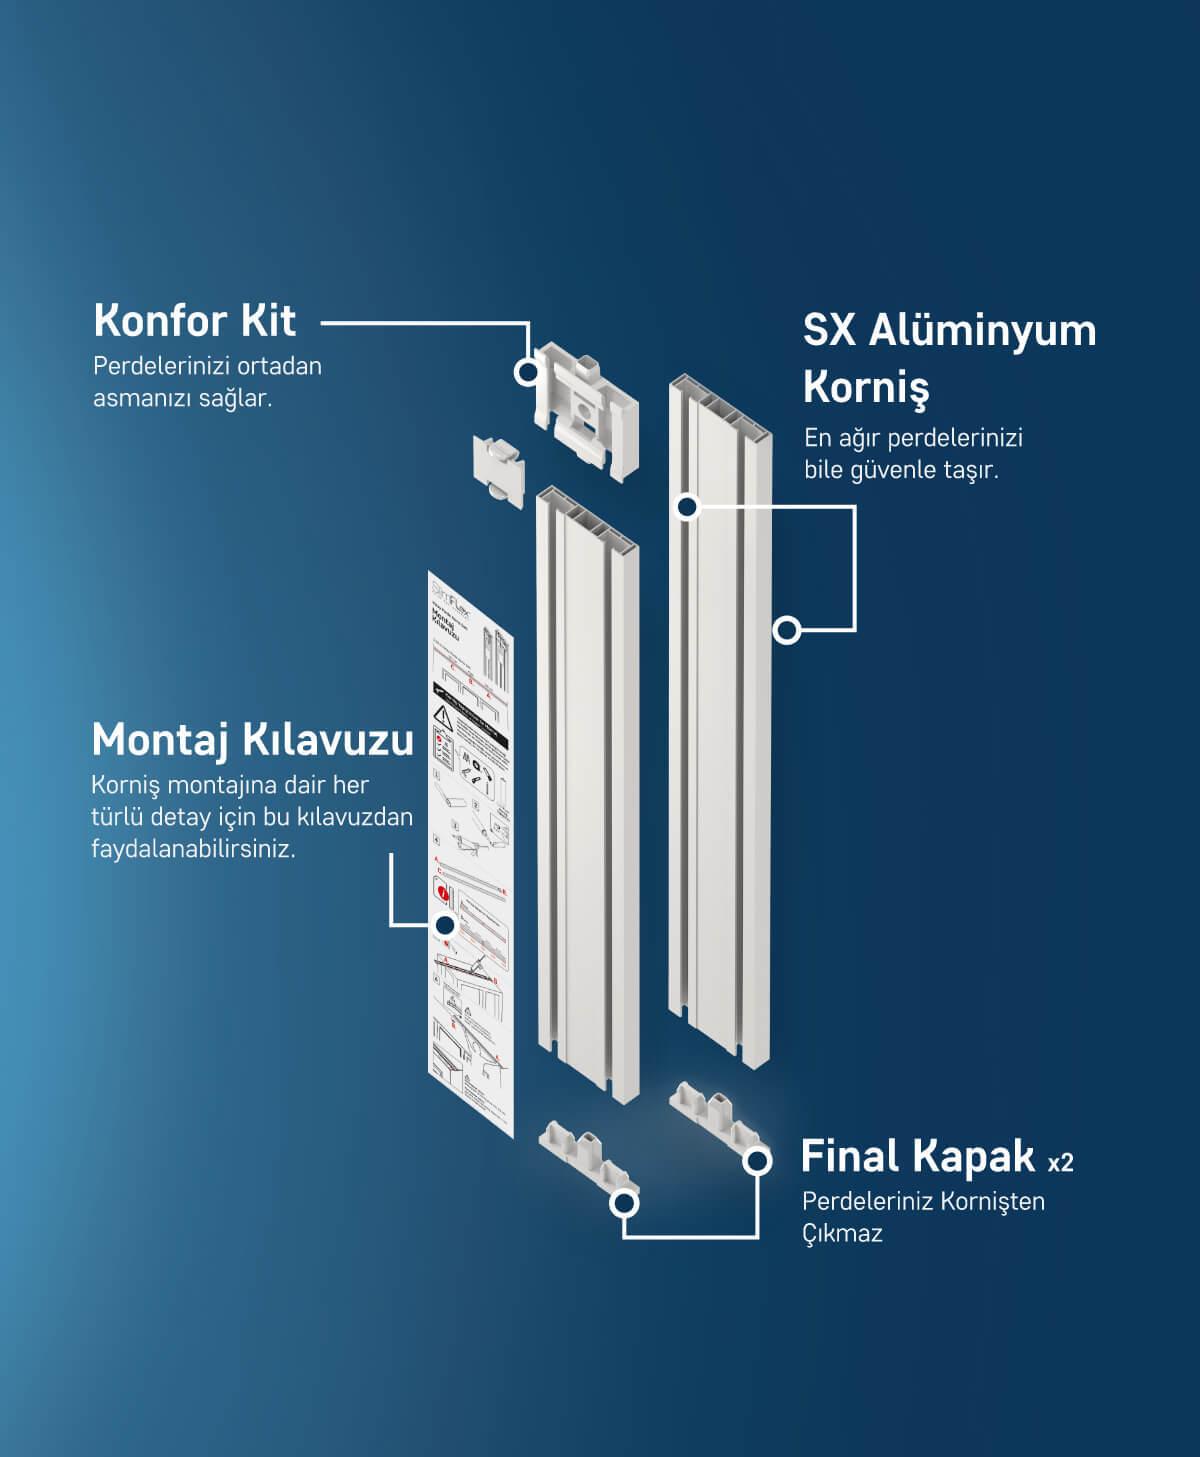 Slimflex sx yenilikçi alüminyum korniş 1